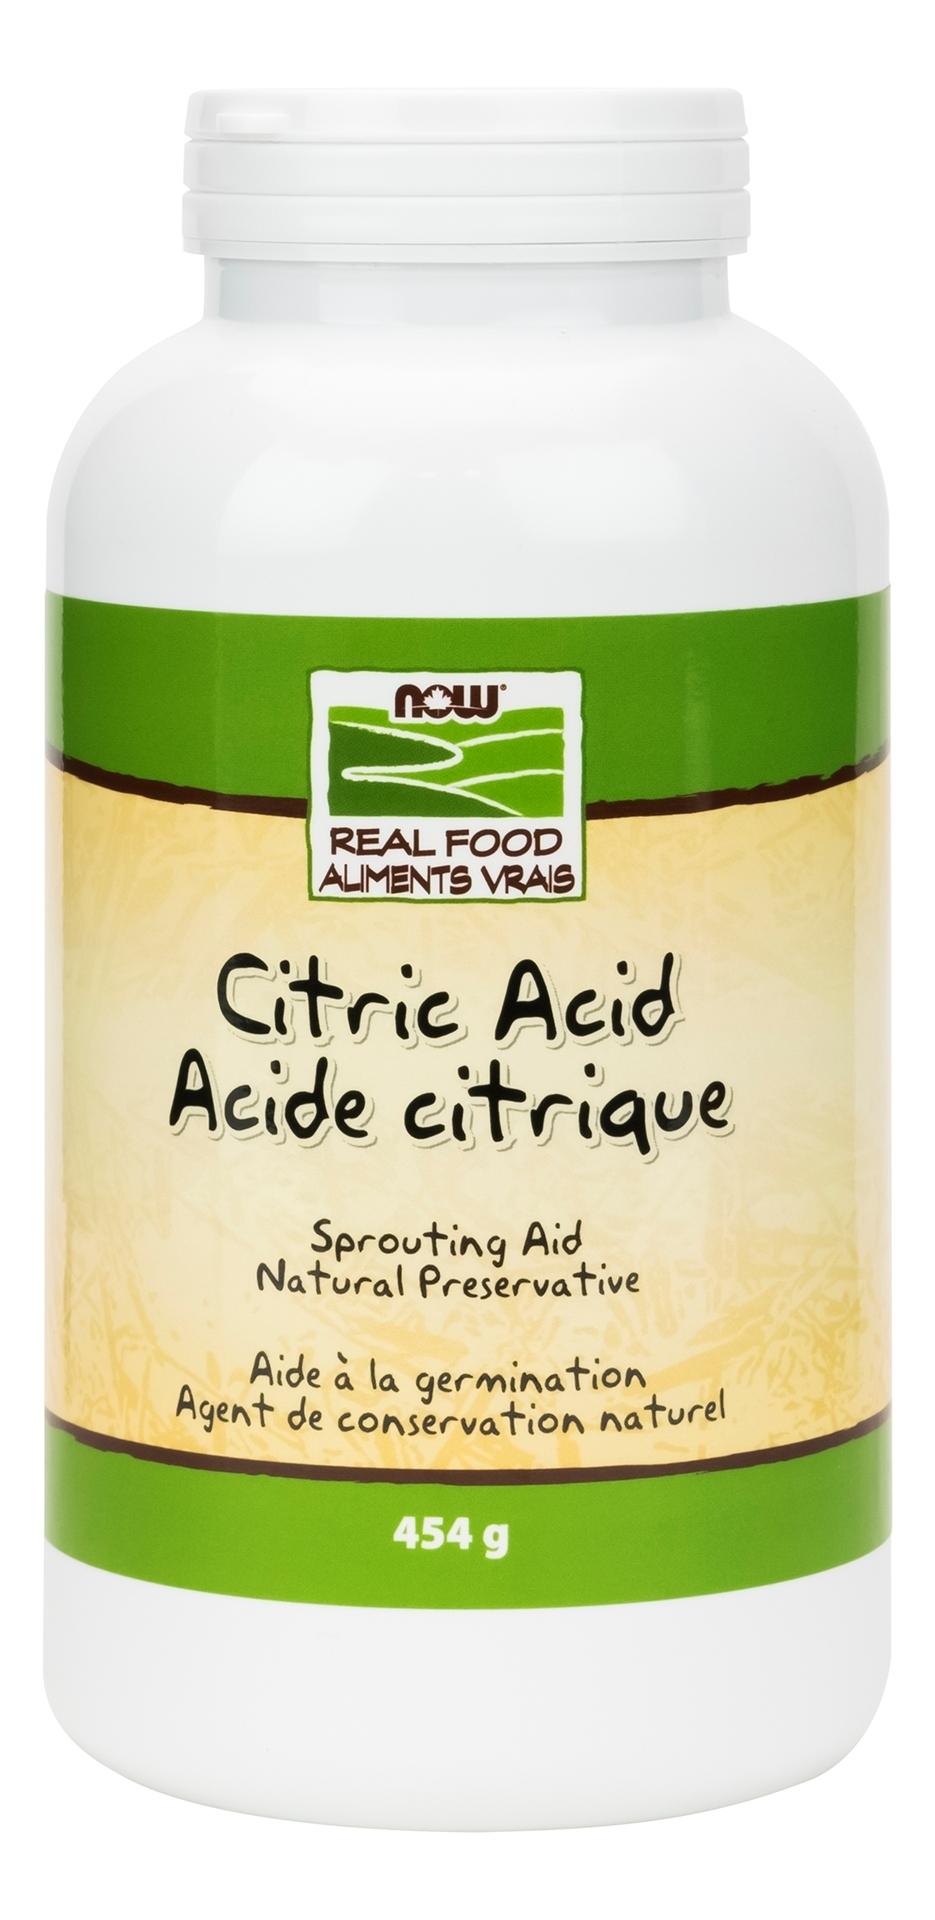 NOW Foods Citric Acid Powder | BuyWell.com | BuyWell.com ...